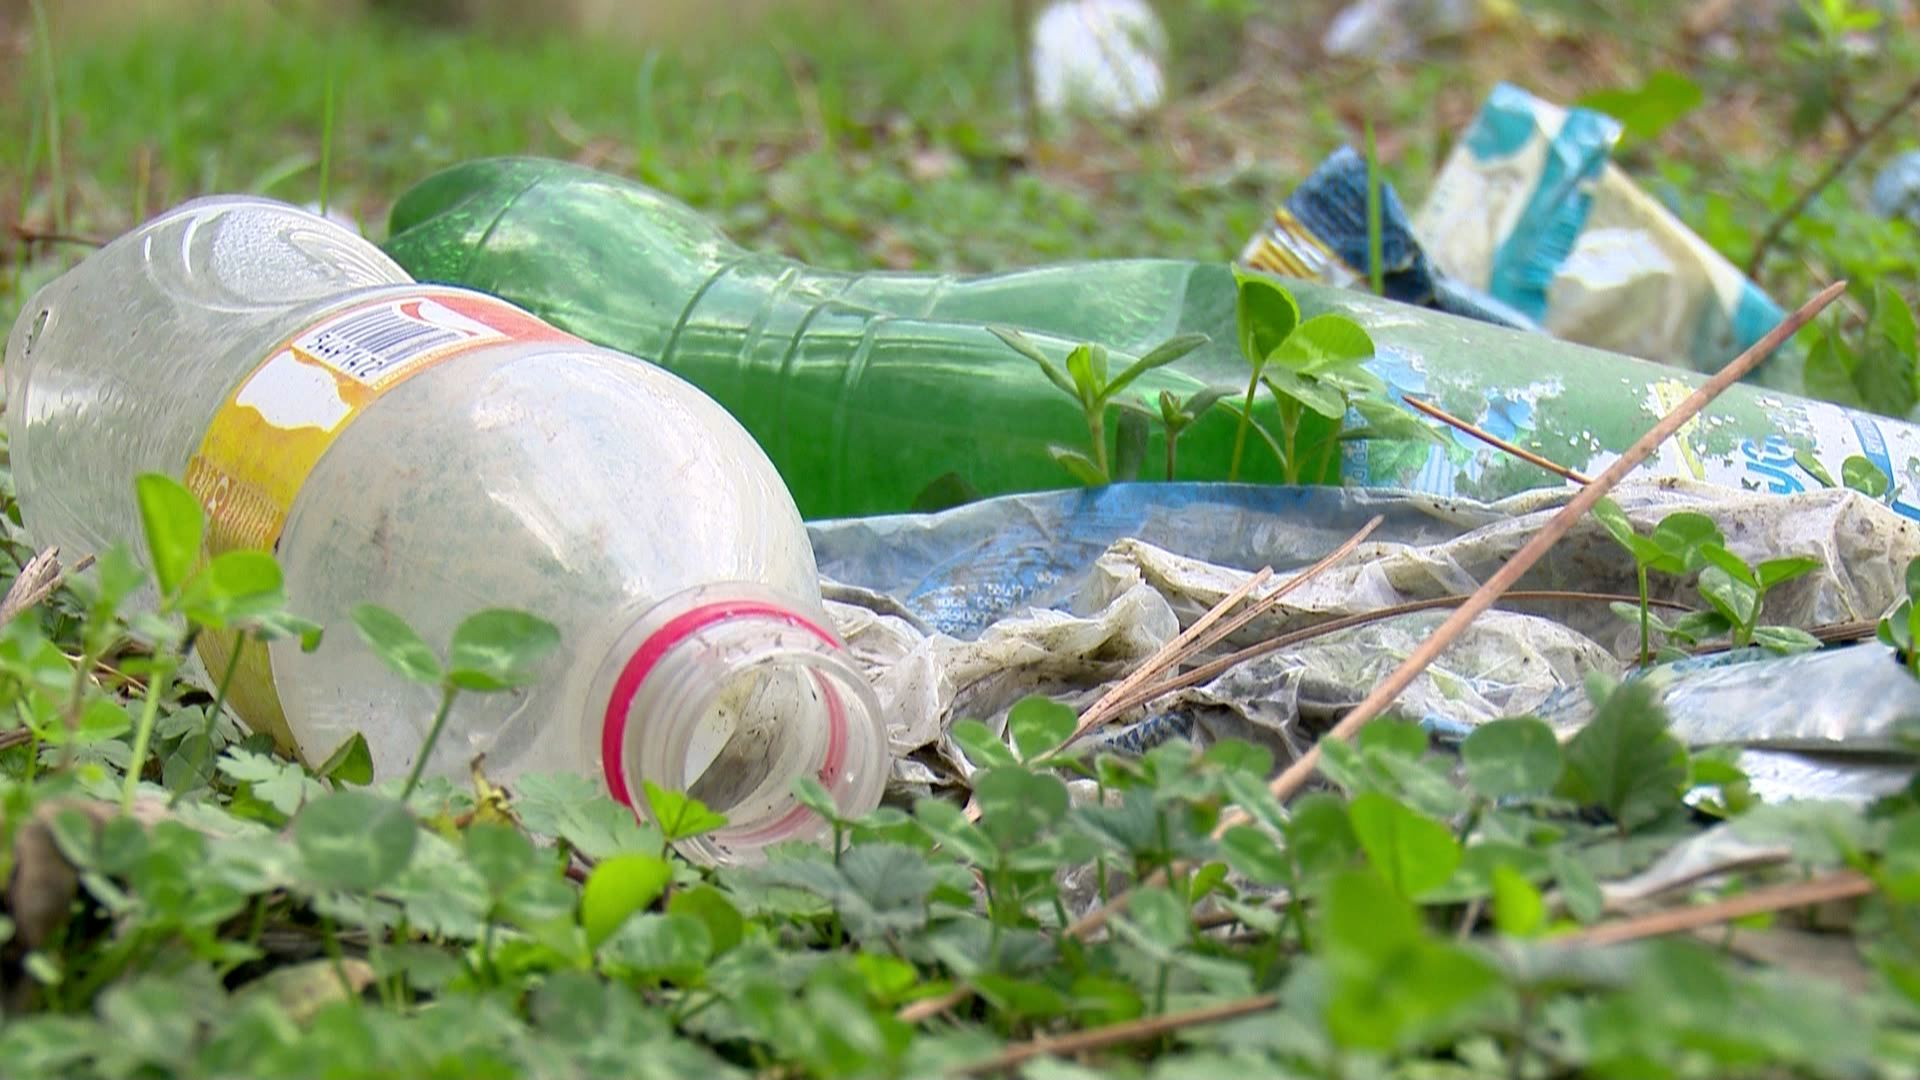 Littered territory in Kobuleti, near the free tourist zone